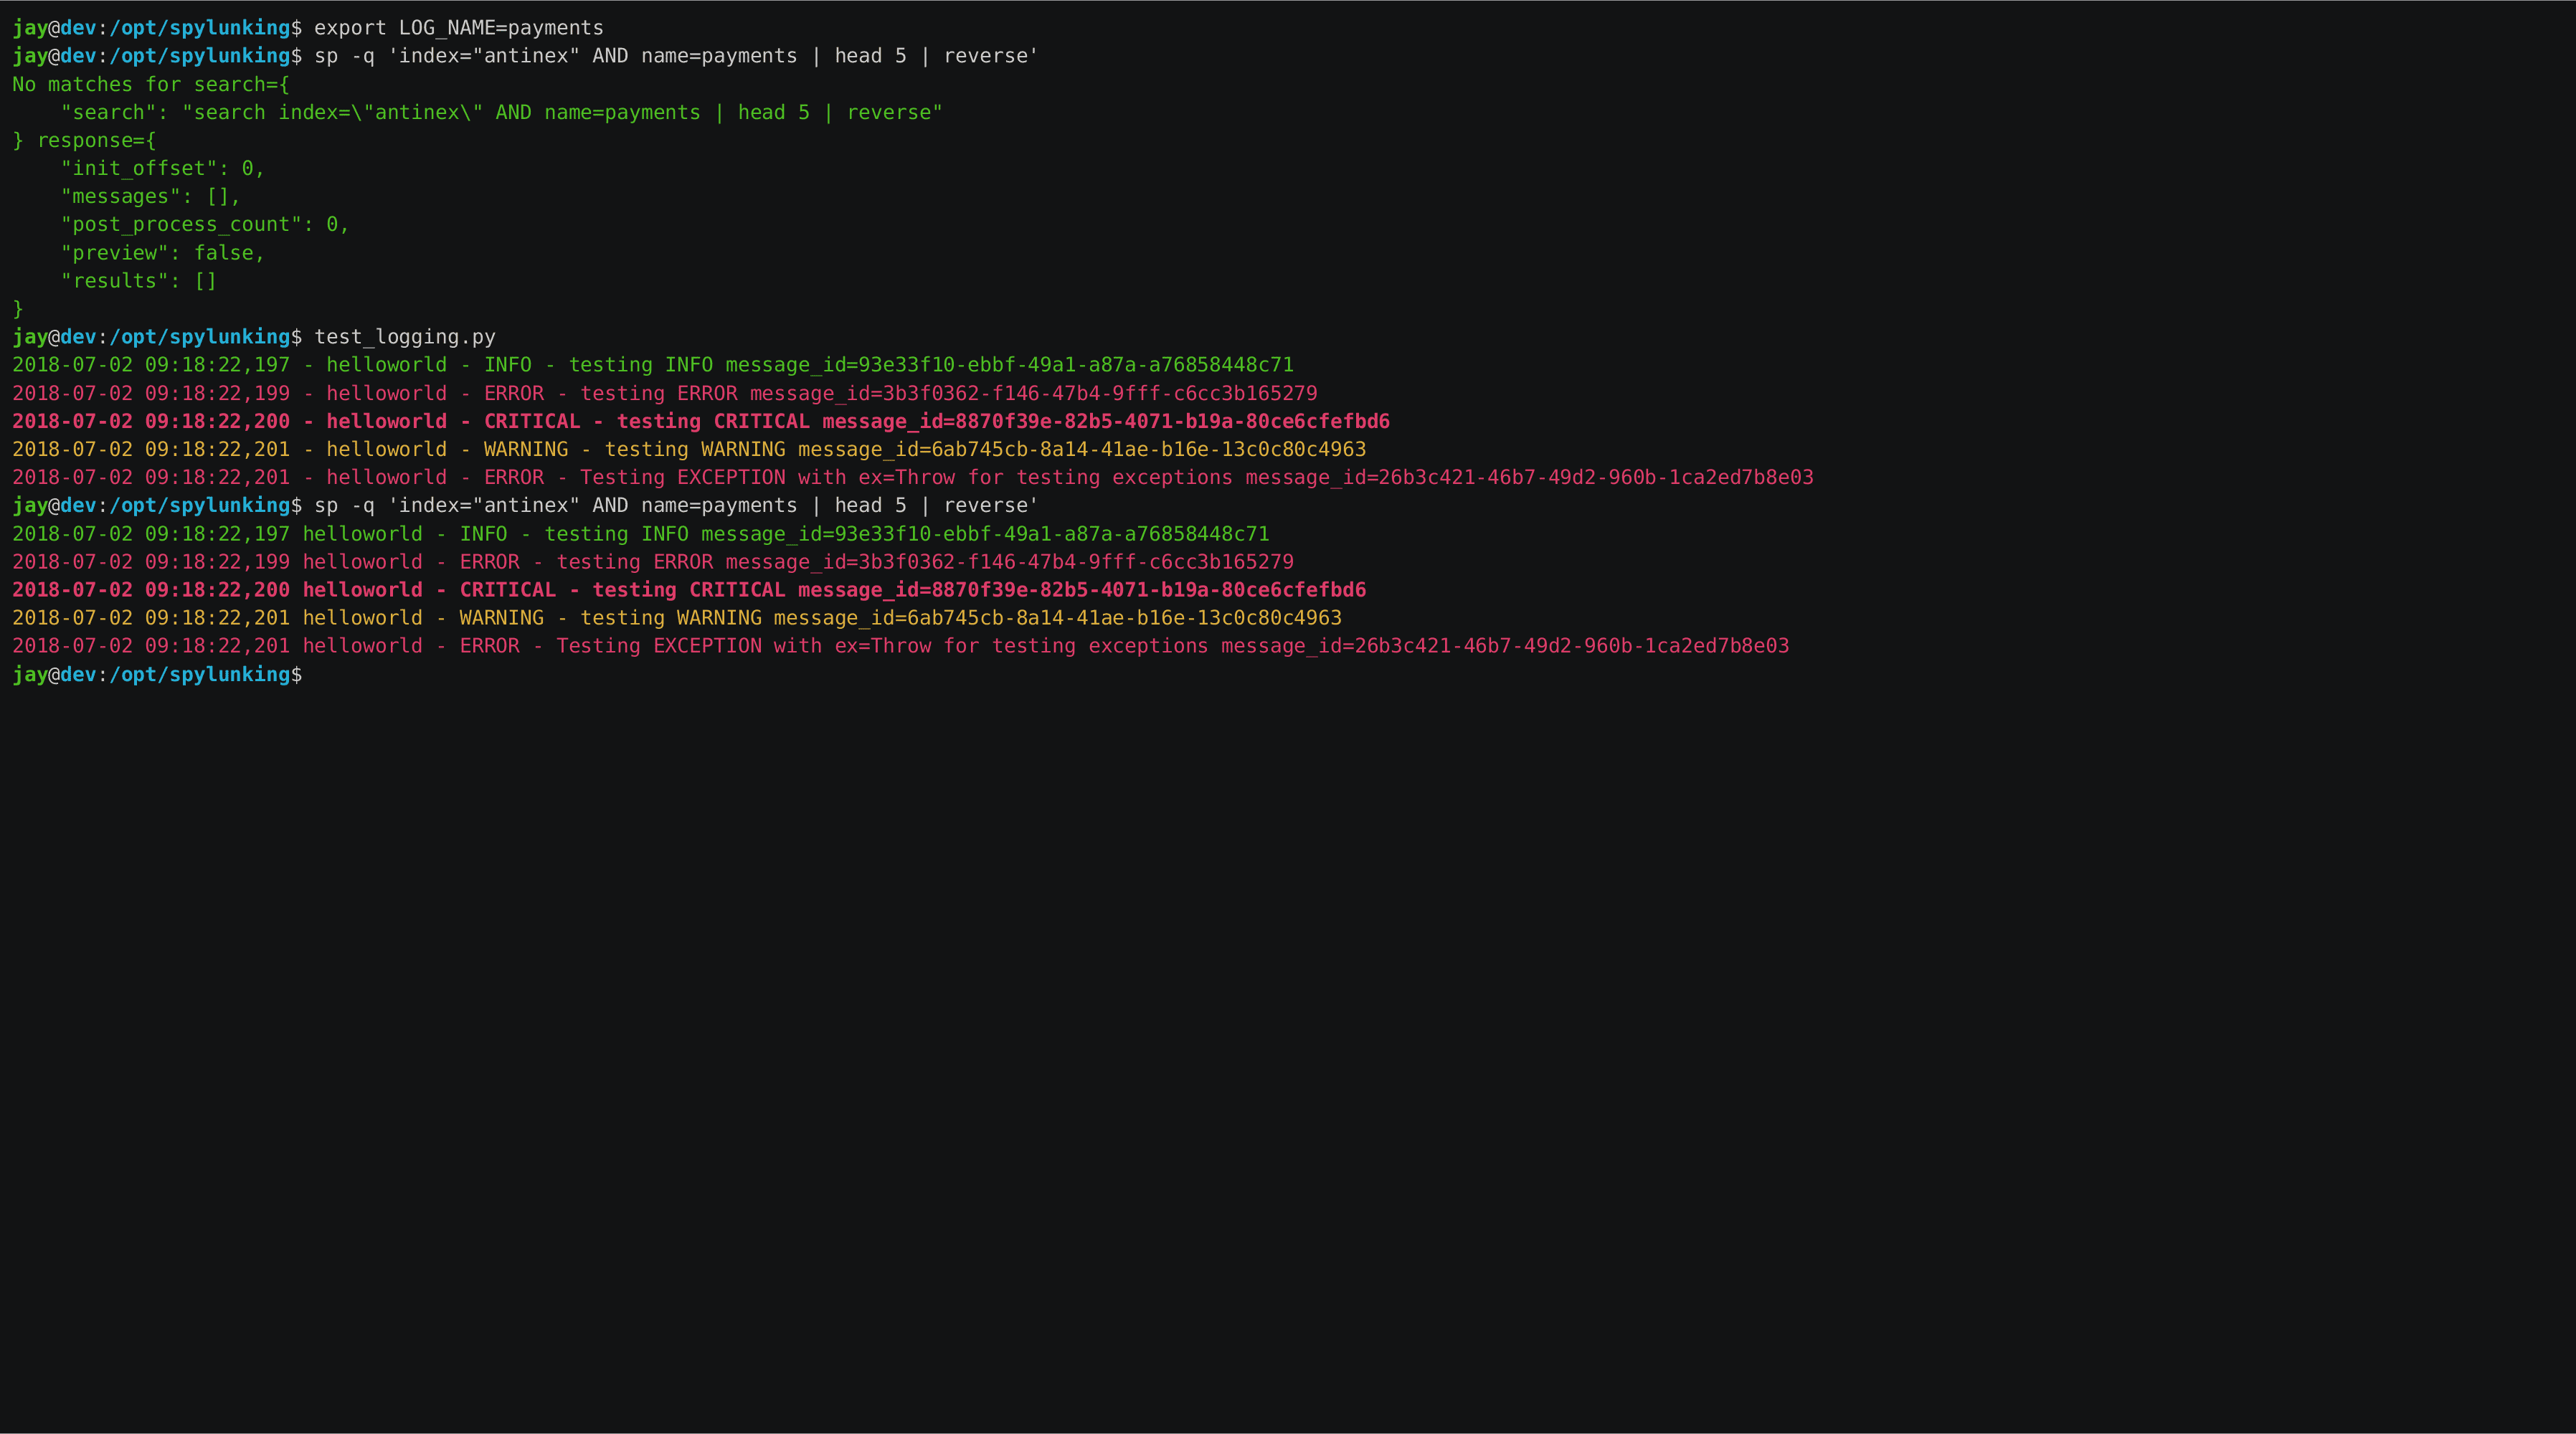 spylunking/README rst at master · jay-johnson/spylunking